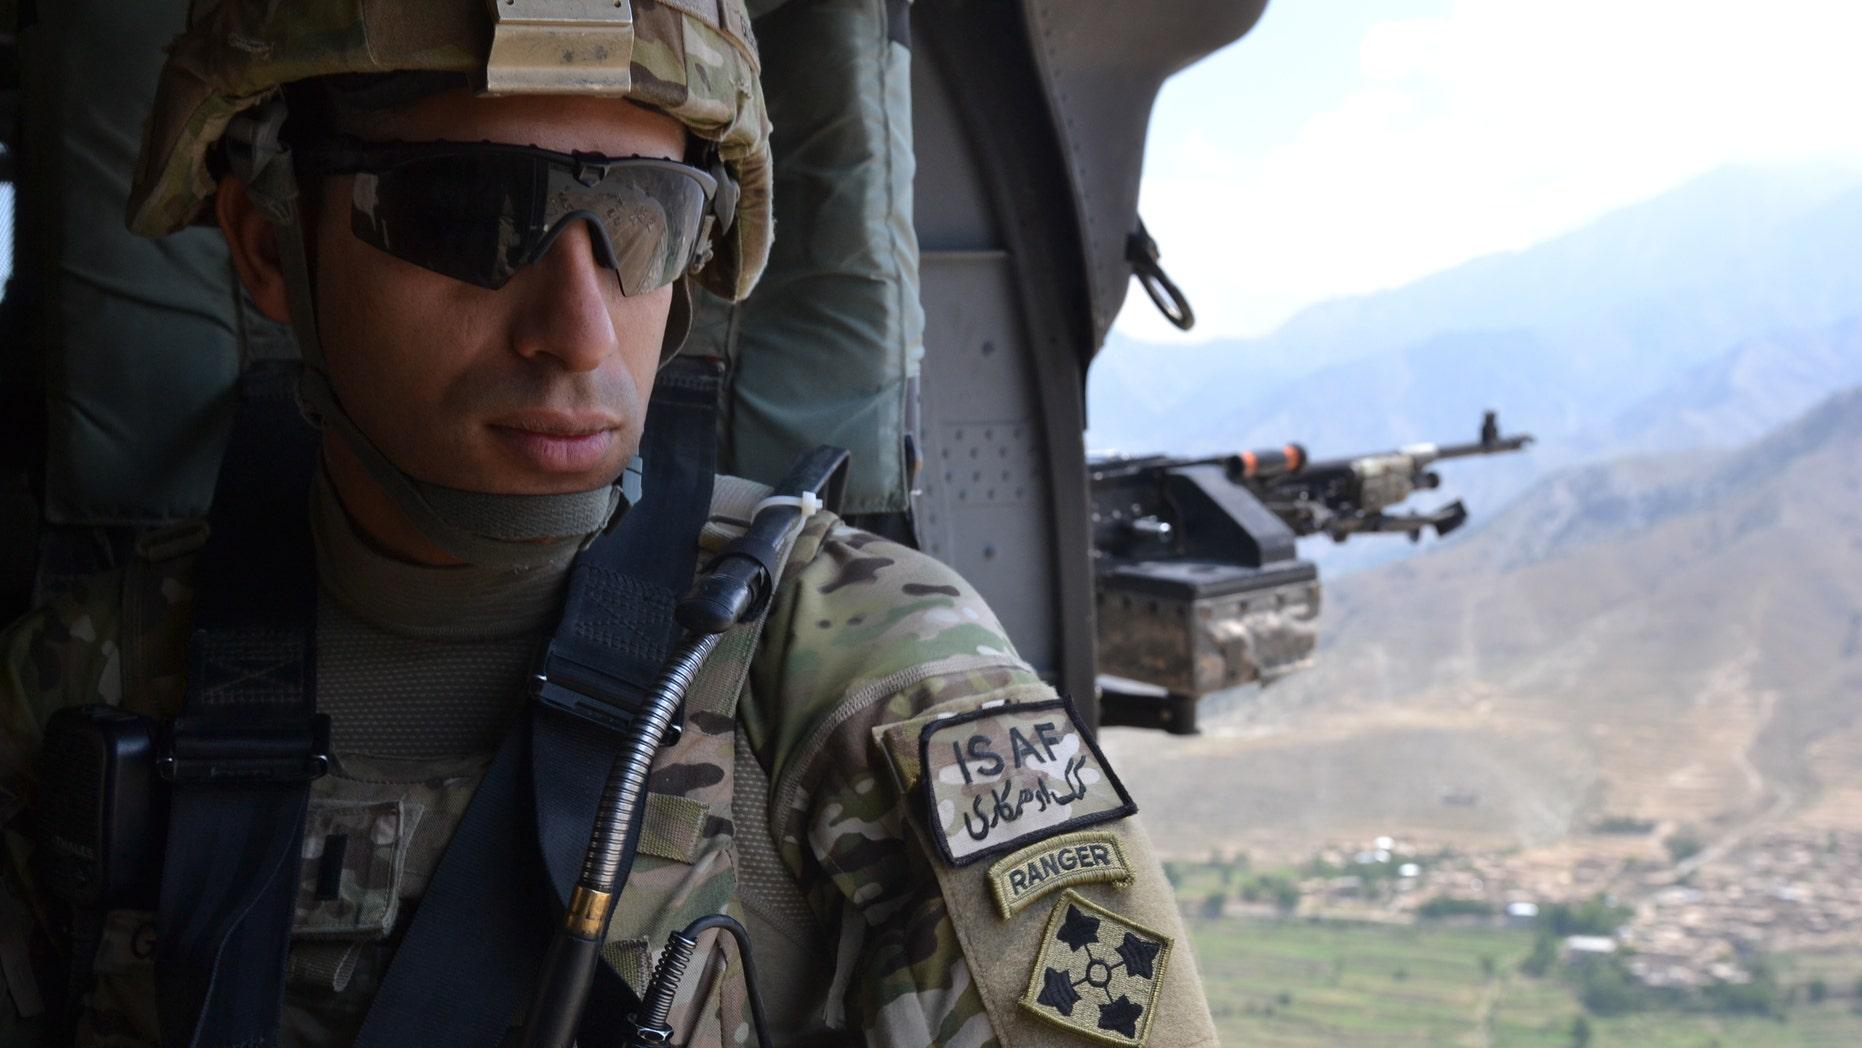 Capt. Florent Groberg (US Army)